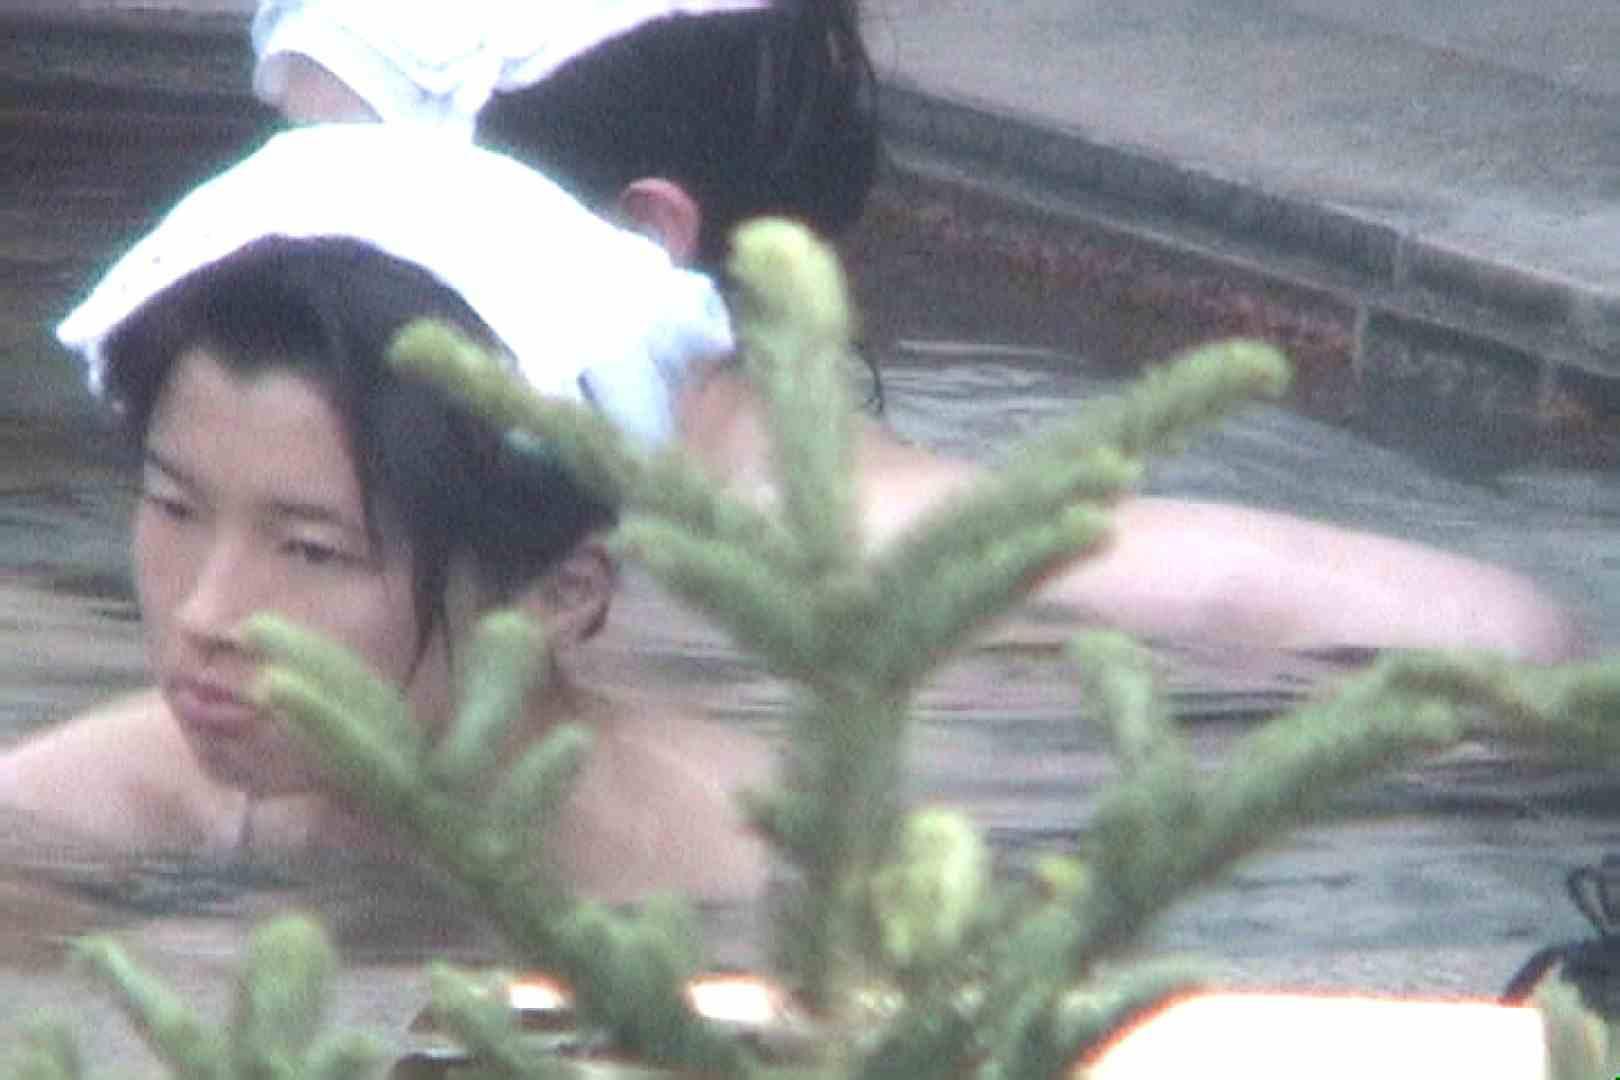 Aquaな露天風呂Vol.80【VIP限定】 盗撮 | HなOL  66pic 66